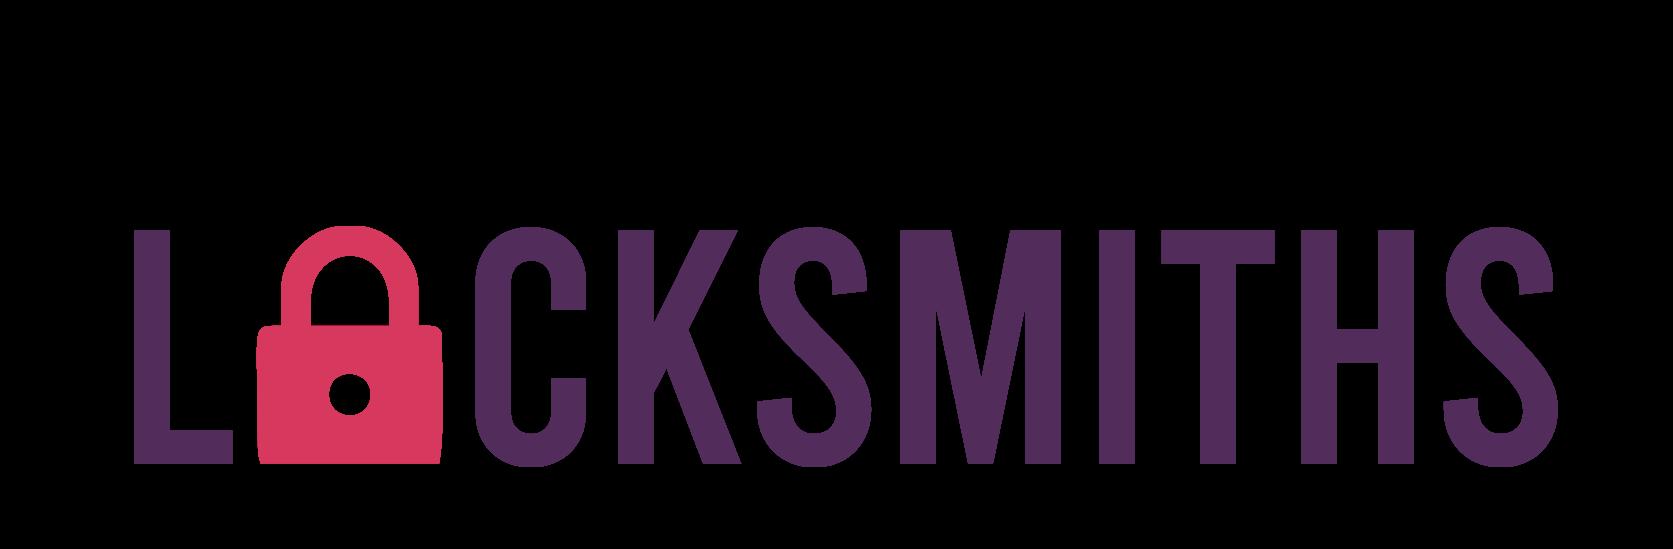 Wollongong locksmith Logo